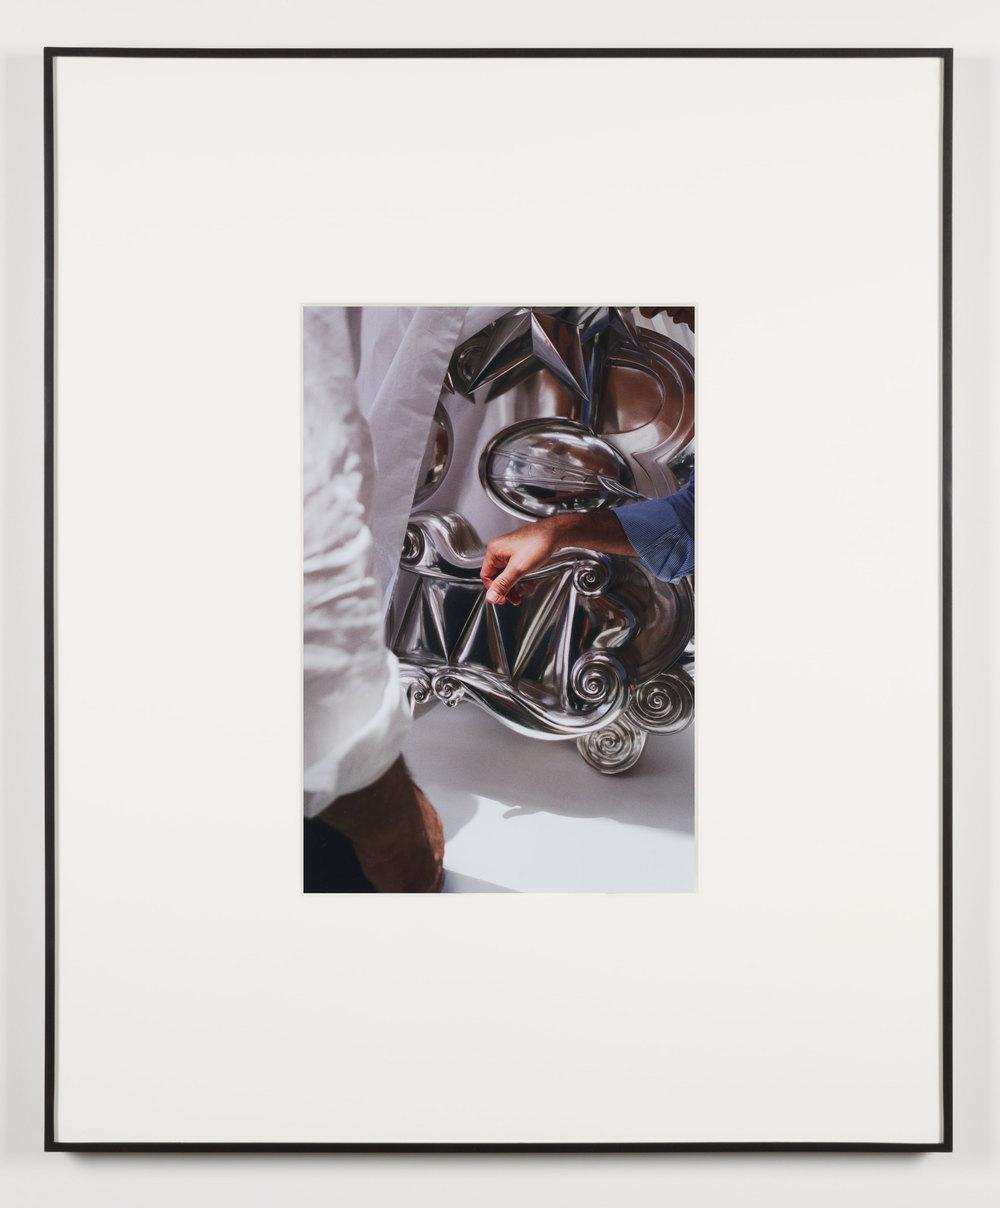 Die Abstimmung (Beirut, Lebanon, June 1, 2013), Frame No. 13    2014   Chromogenic print  20 x 13 1/2 inches   Gastarbeiten, 2014